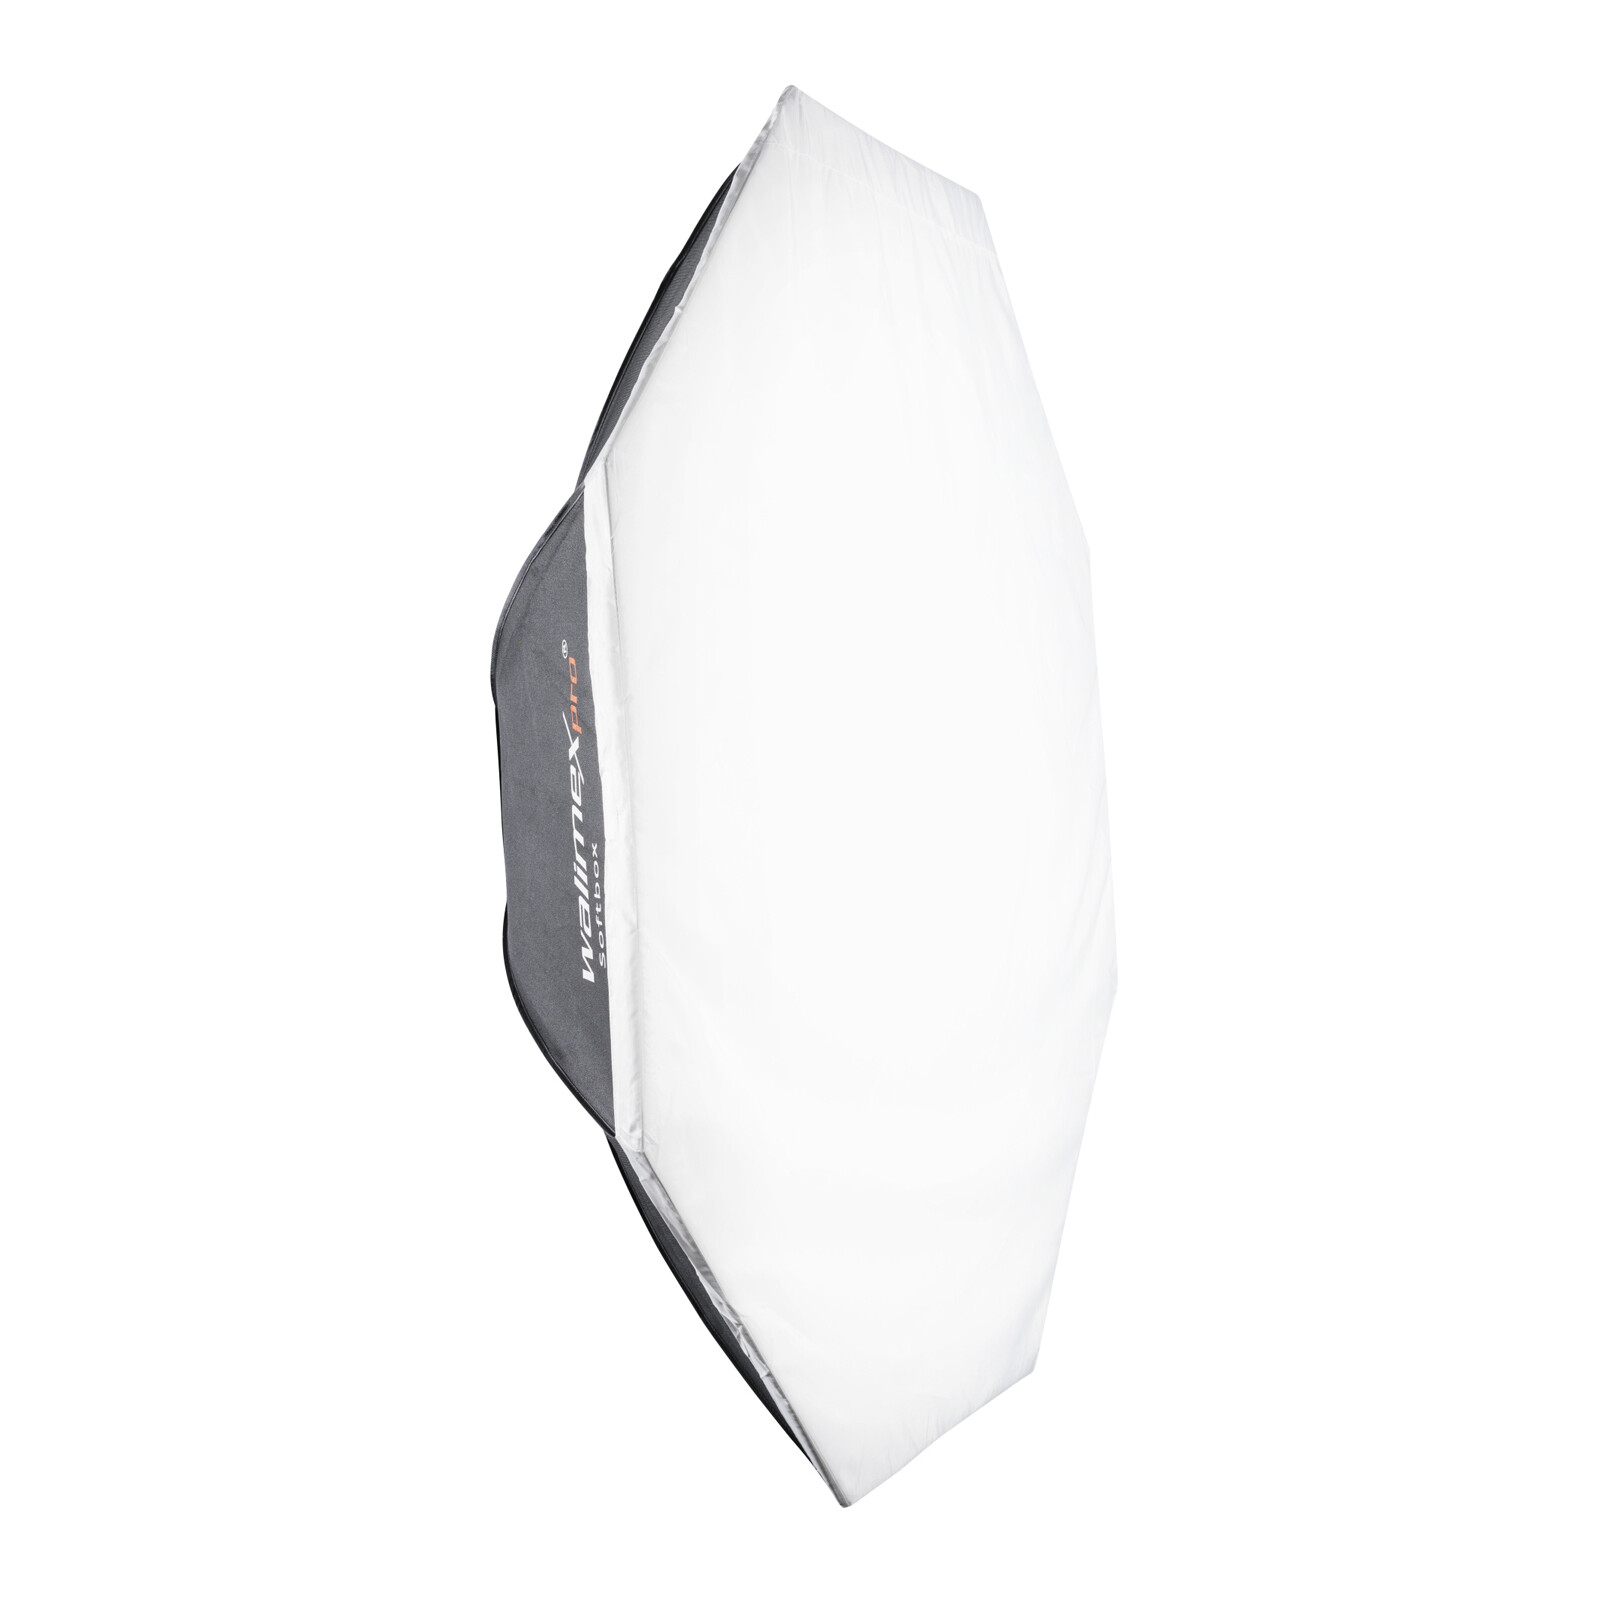 walimex pro Octagon SB Ø140cm für Multiblitz V